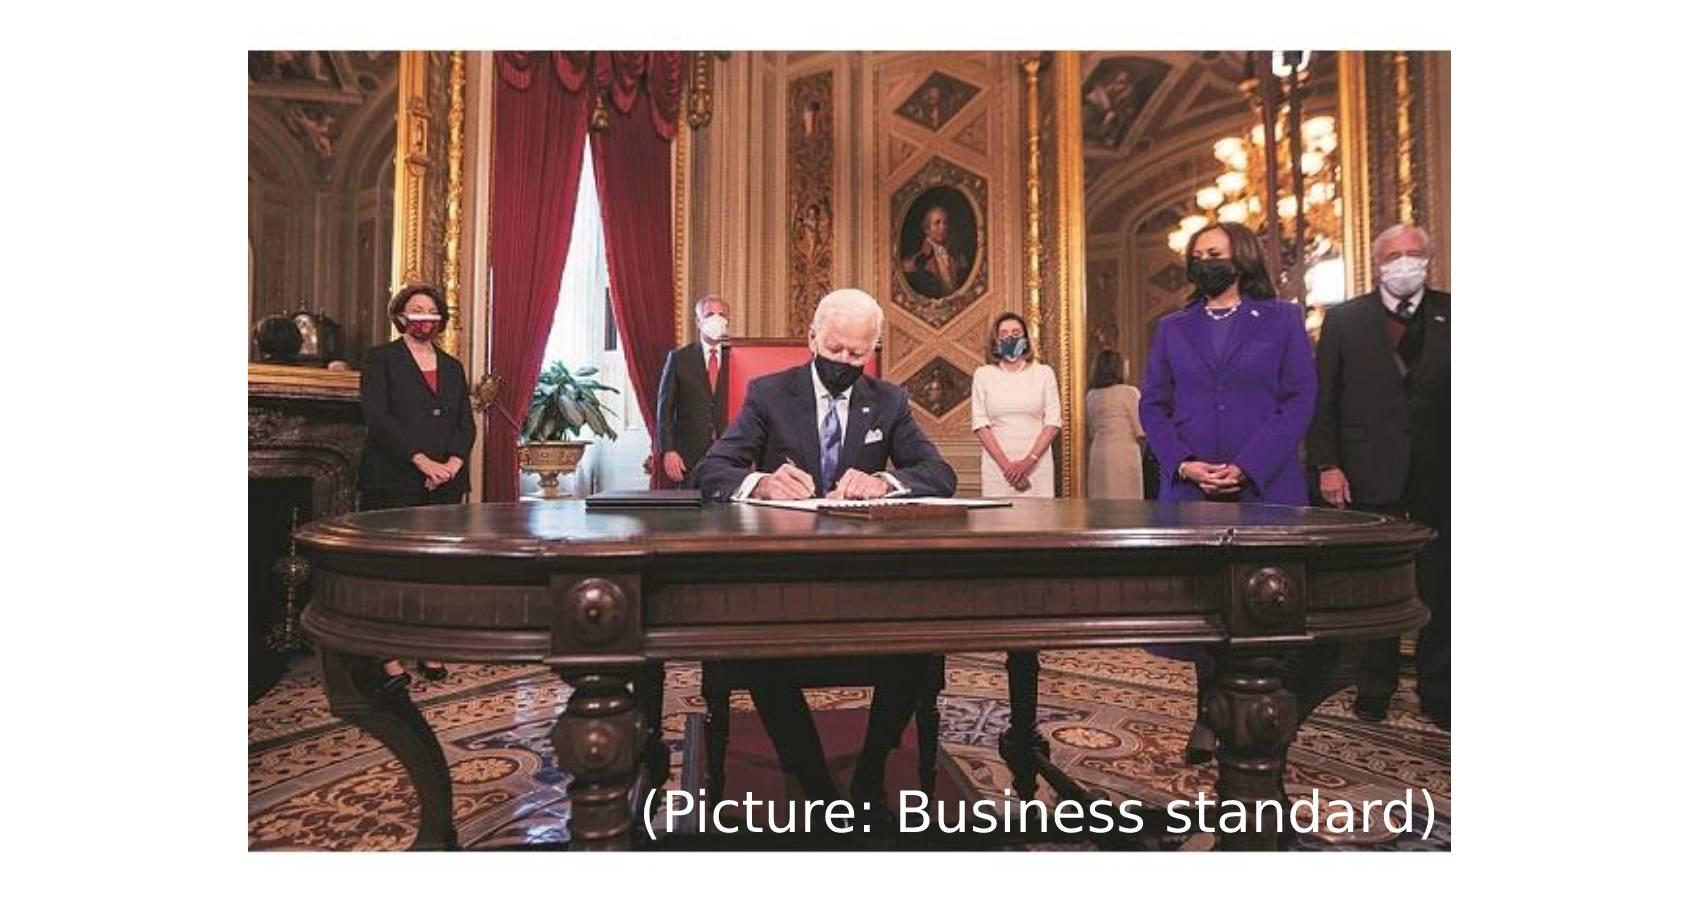 President Biden Cancels Trump Proposal To Time-Limit Student Visas